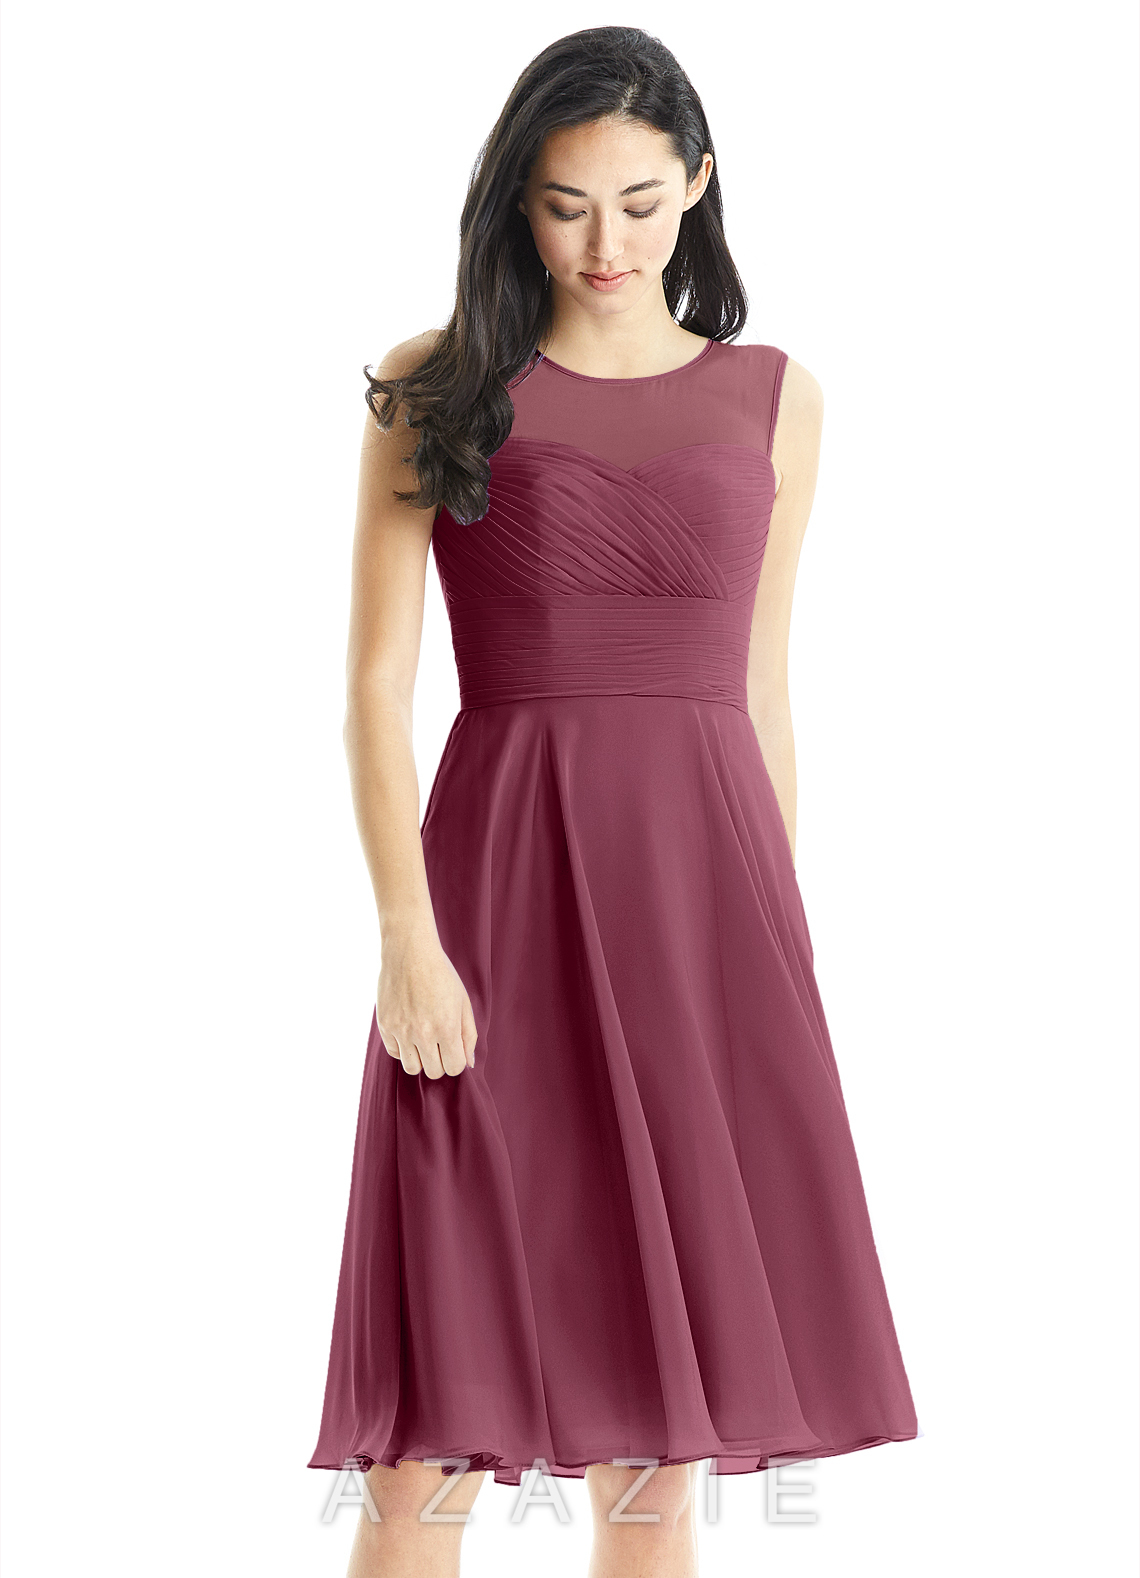 368d60a6d02 Azazie Scarlett Bridesmaid Dresses